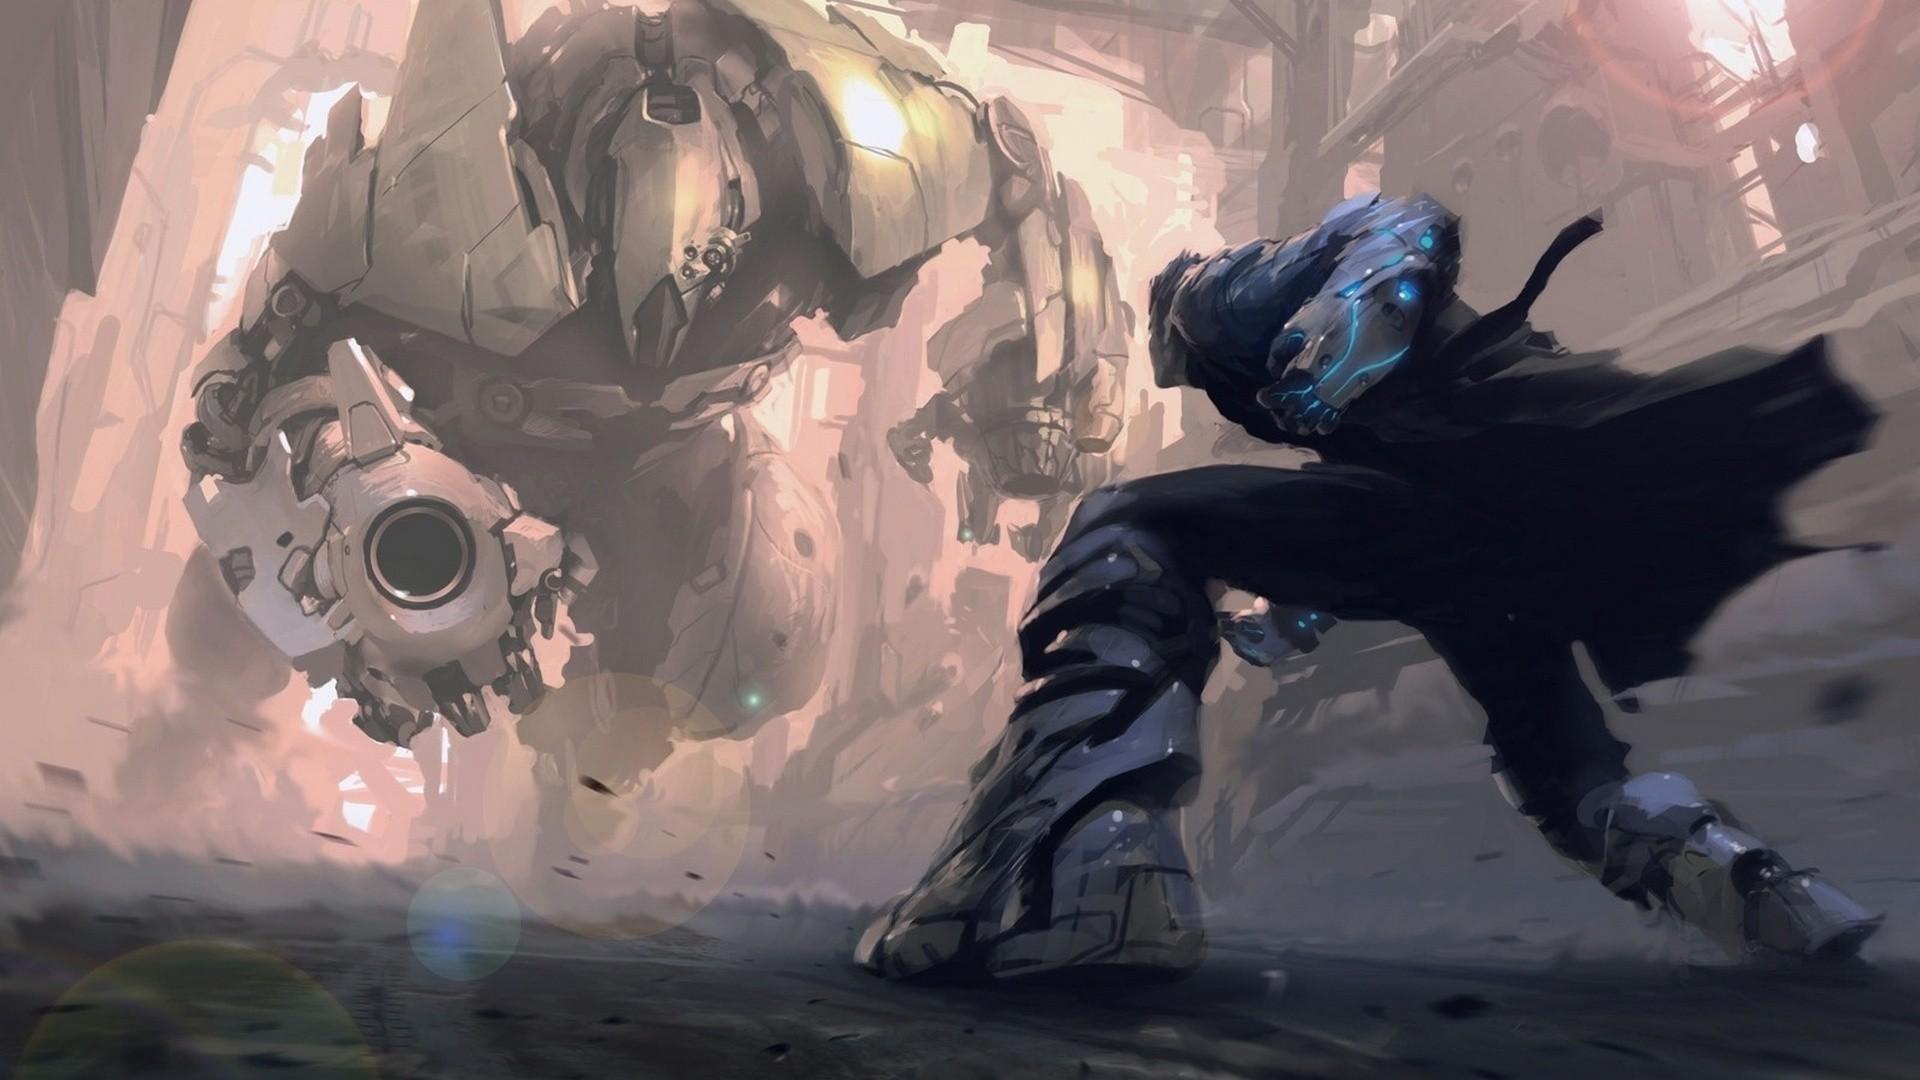 Robot in a Cape Fantasy Art HD Wallpaper. « »